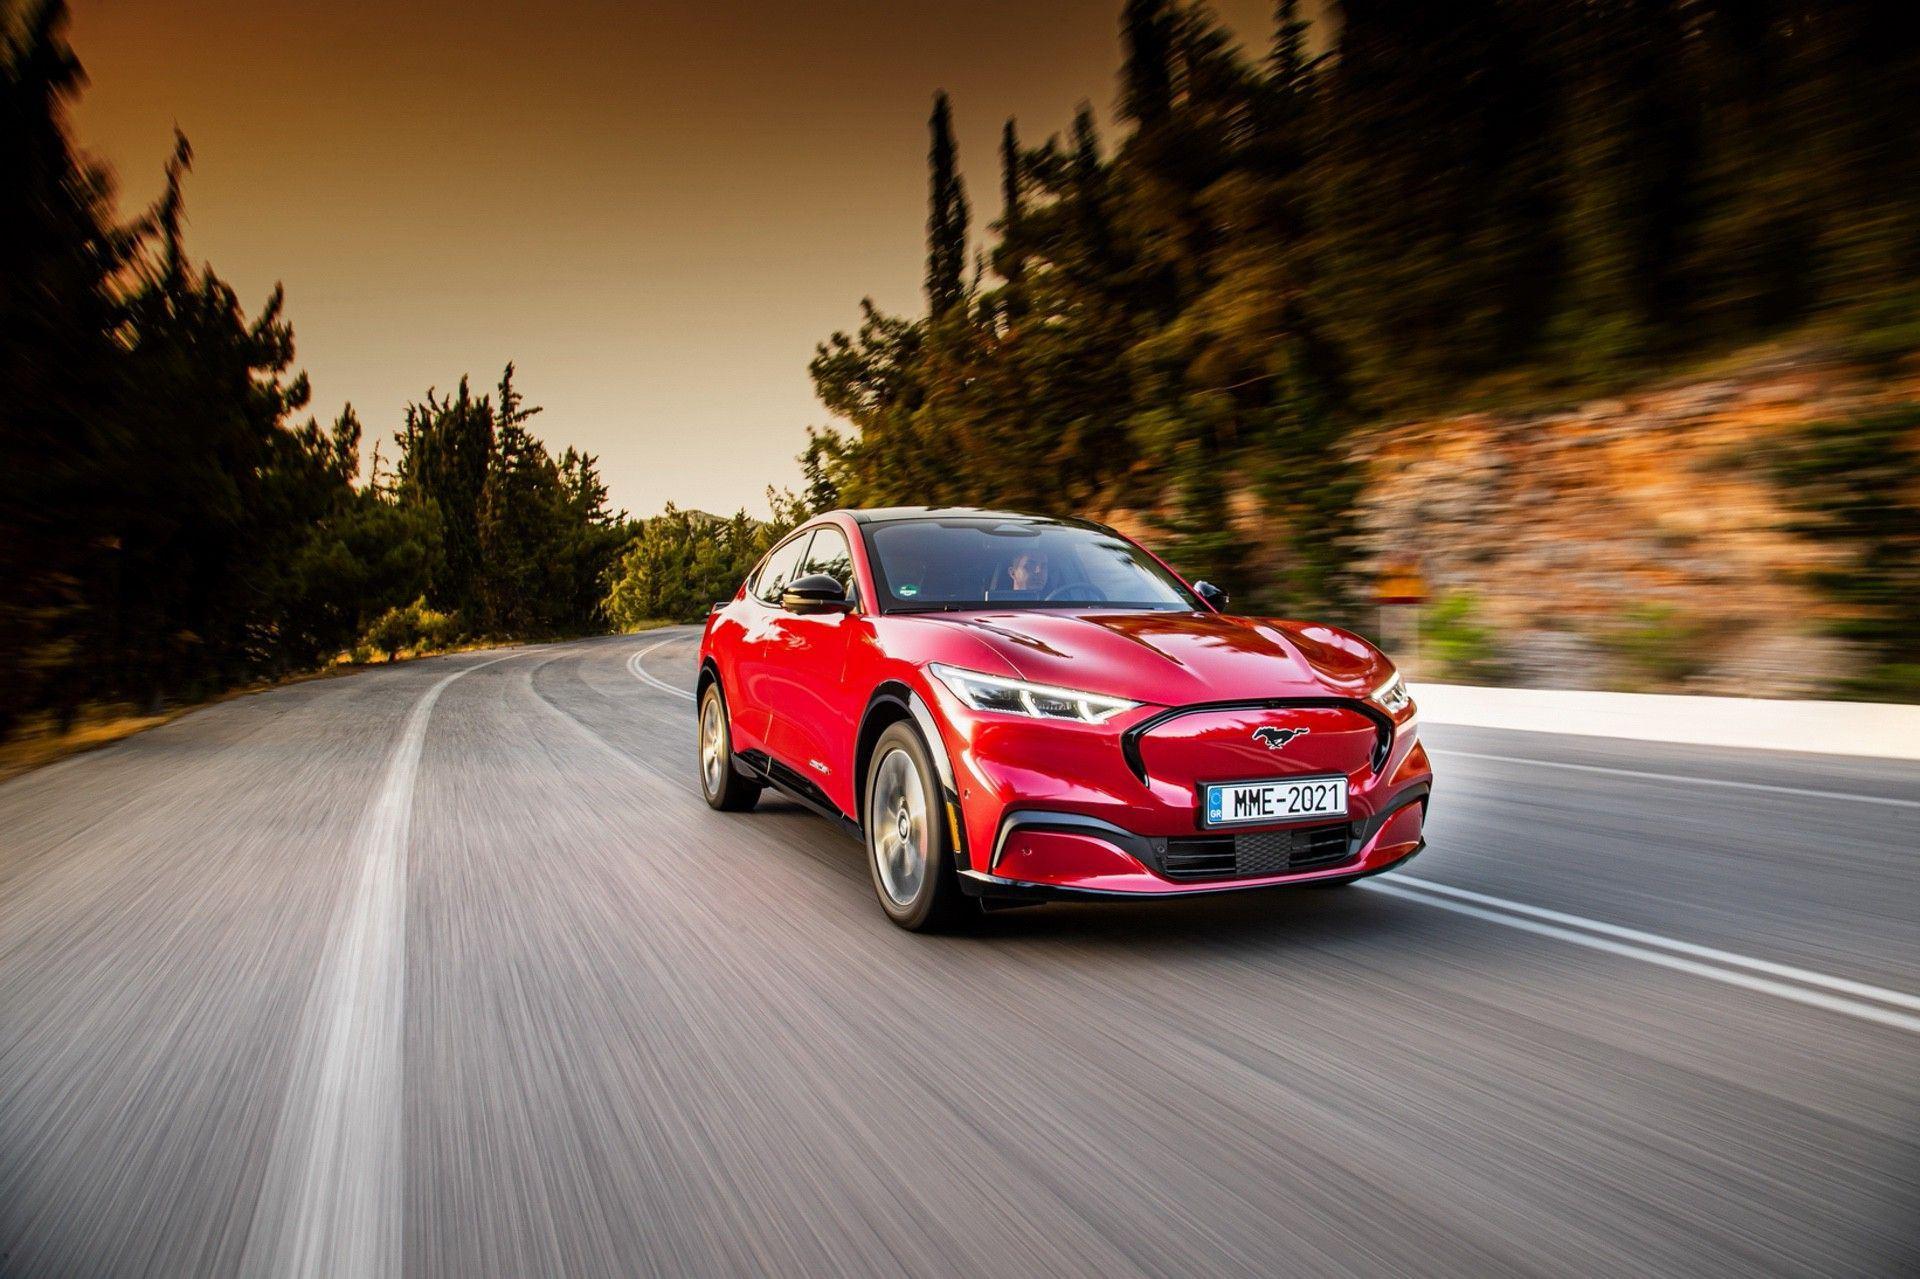 Ford_Mustang_Mach-E_greek_presskit-0115